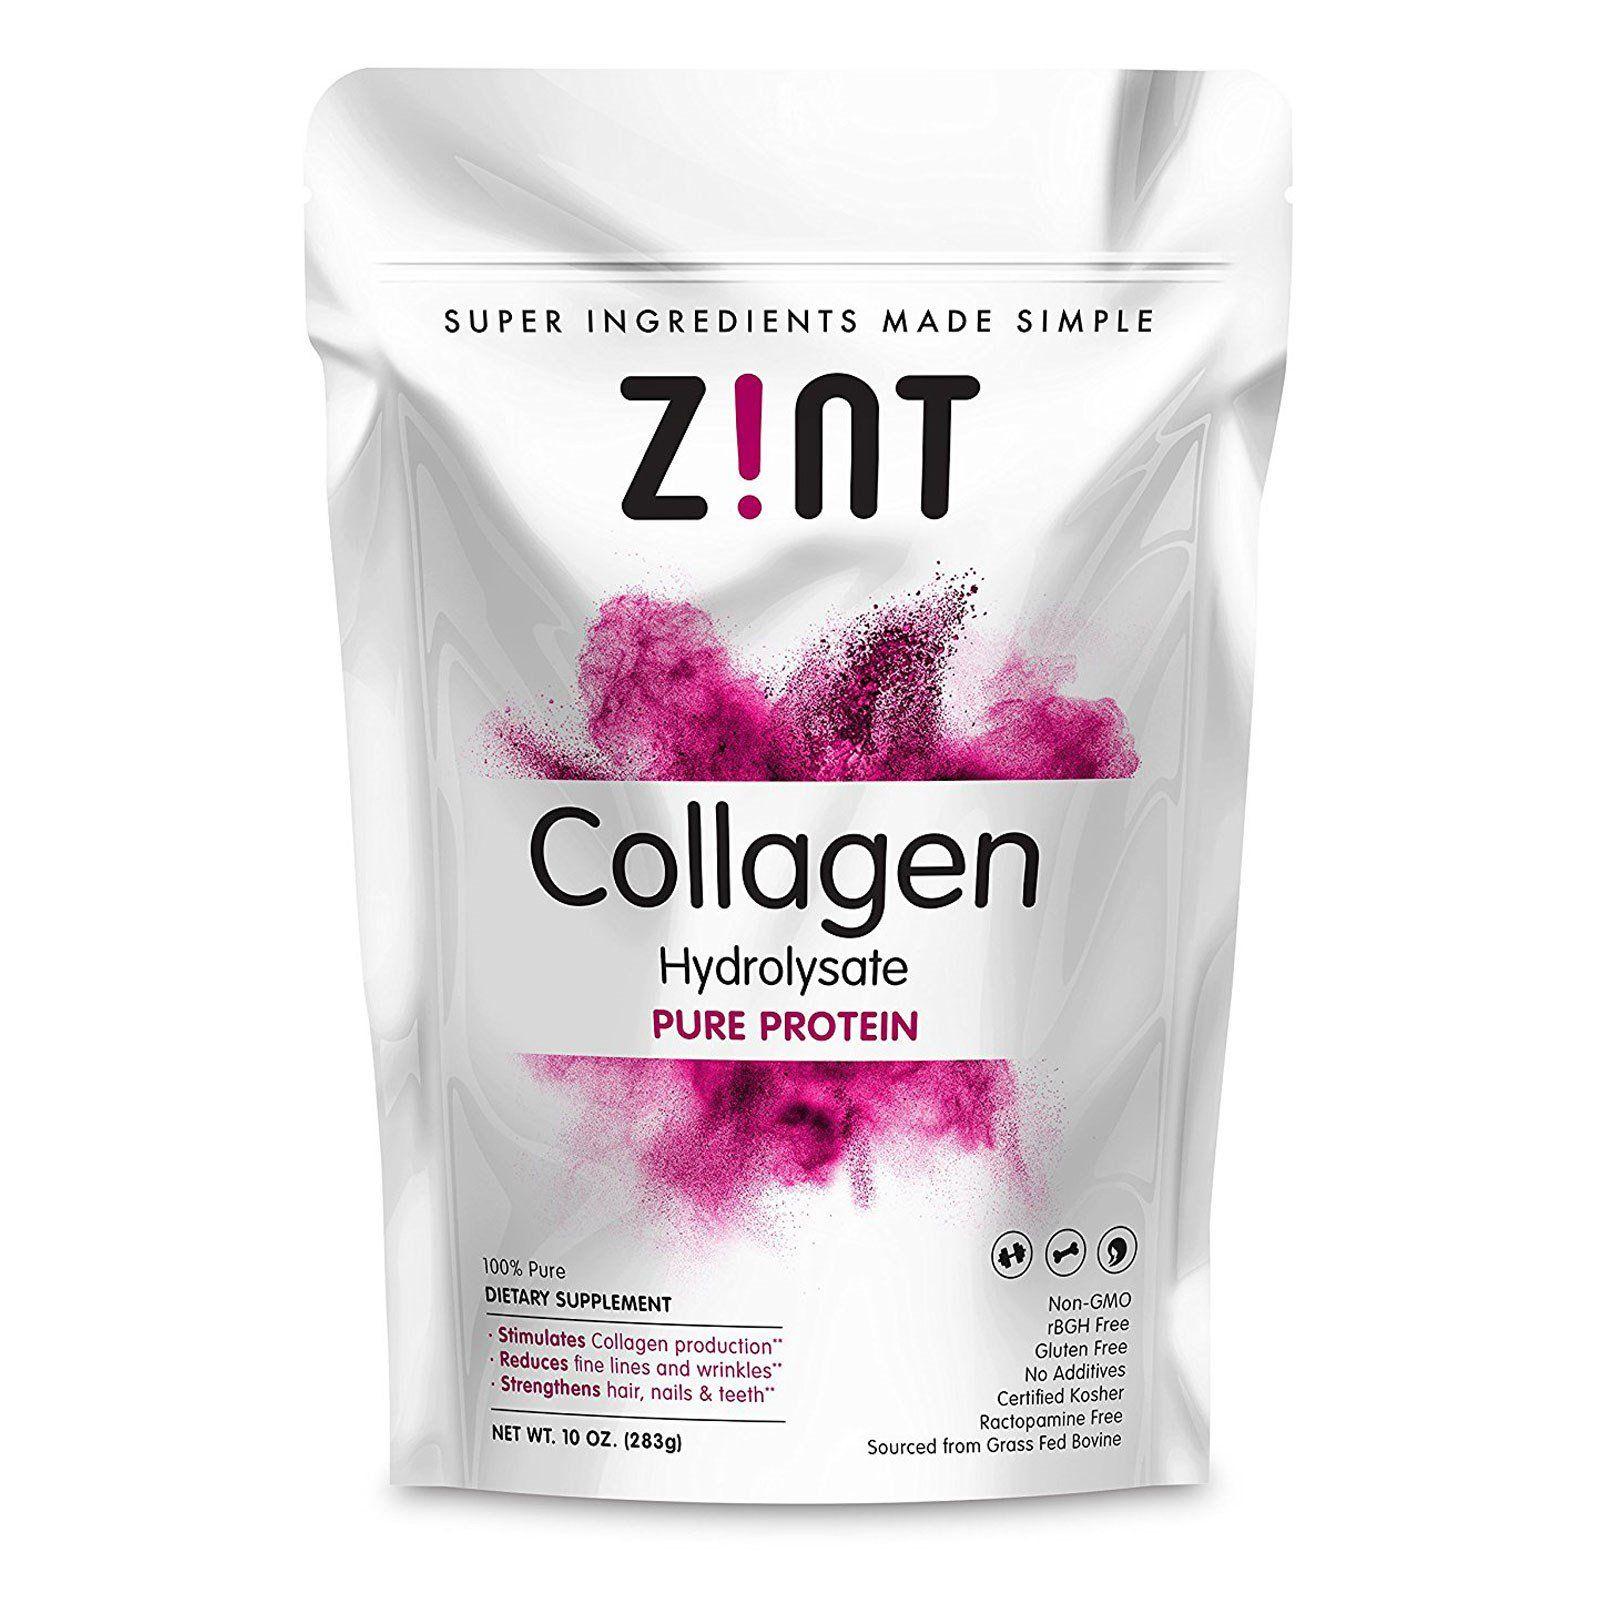 Z Nt Collagen Hydrolysate Chistyj Protein 10 Uncij 283g Iherb Ajherb Zdorove Krasota Kupit P Beef Gelatin Collagen Hydrolysate Collagen Protein Powder